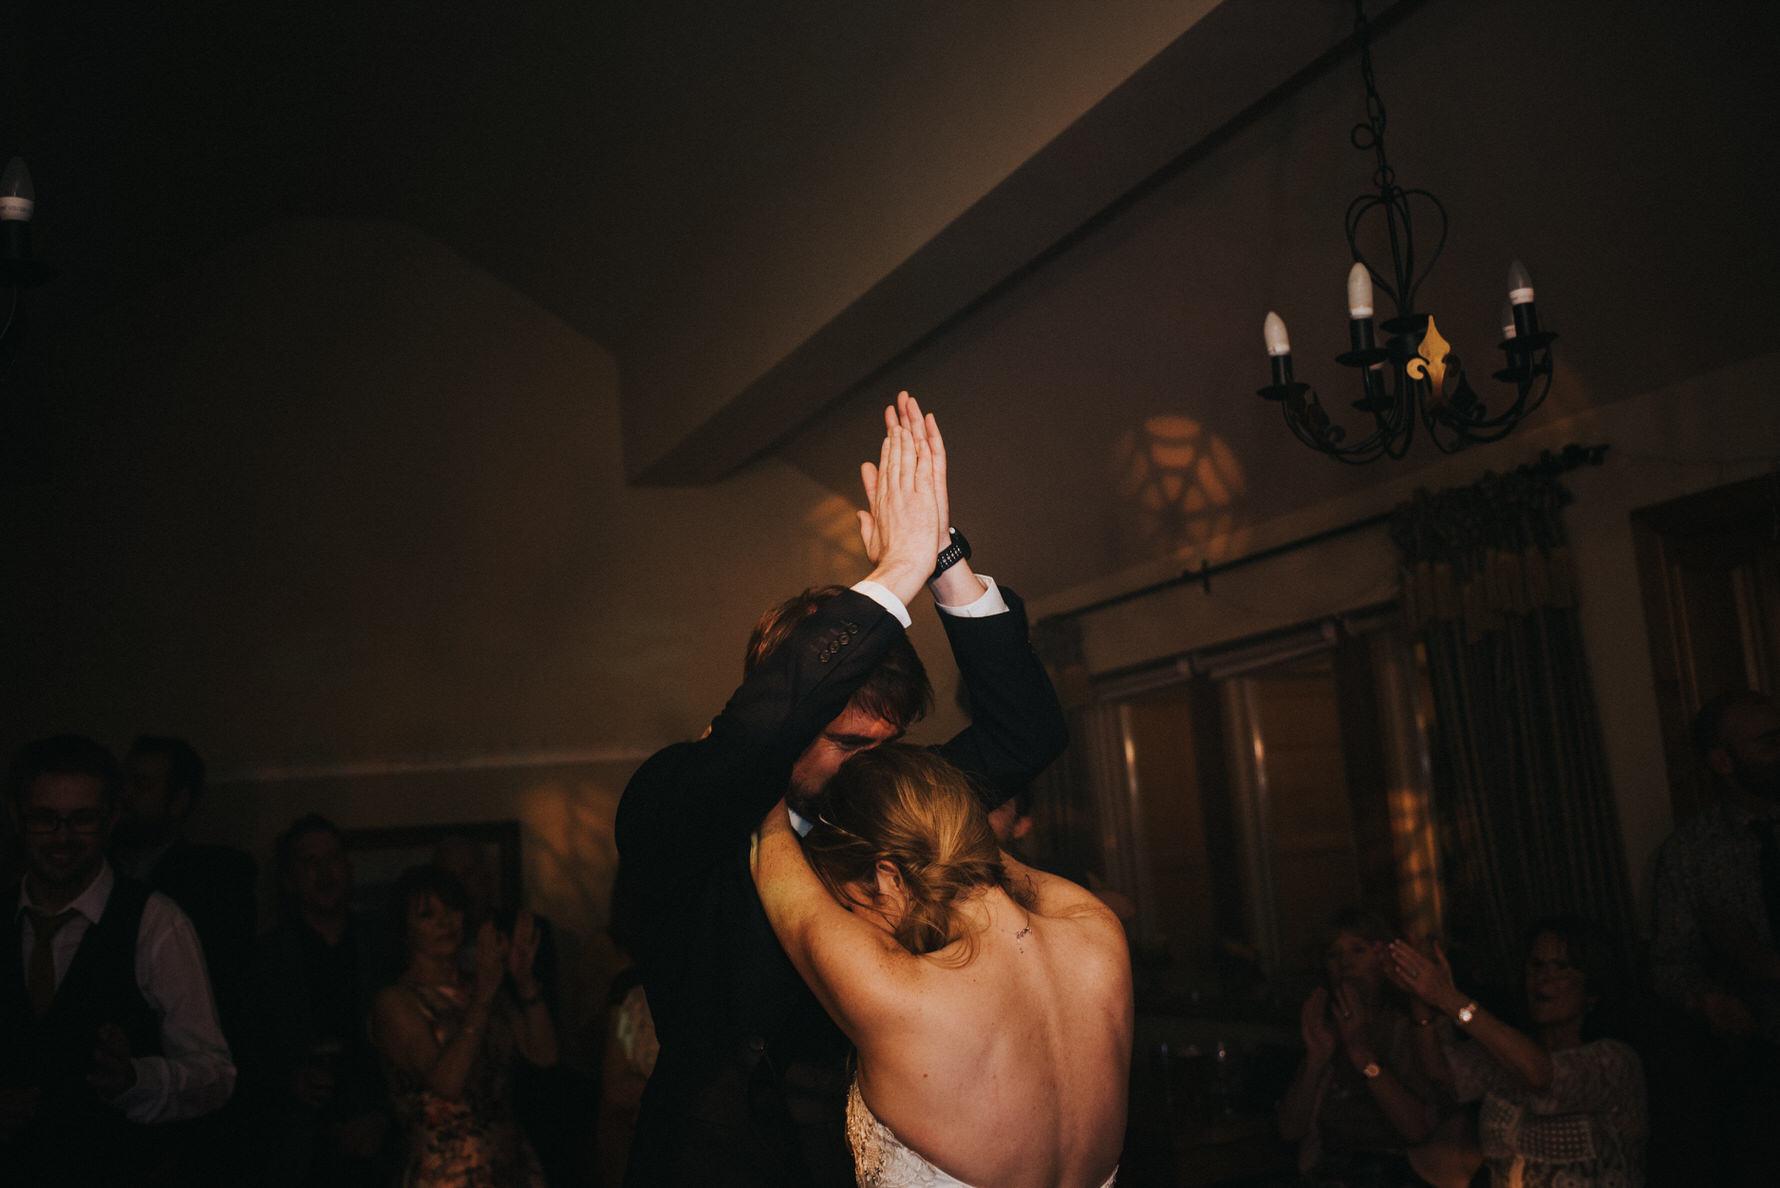 Cheshire wedding photographer - First dance